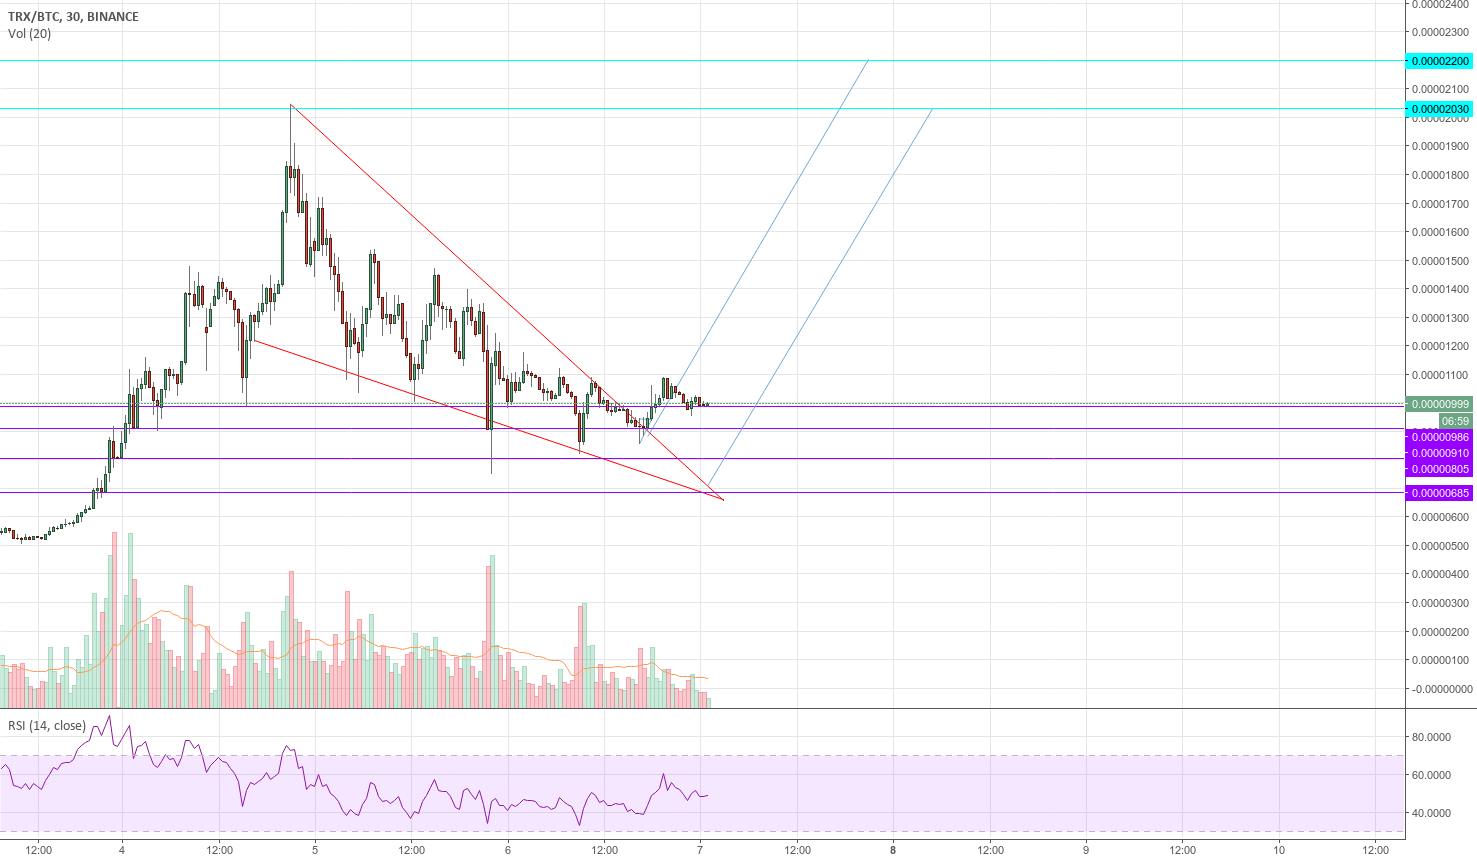 Tronix (TRON/TRX) Descending Wedge - Updated Chart